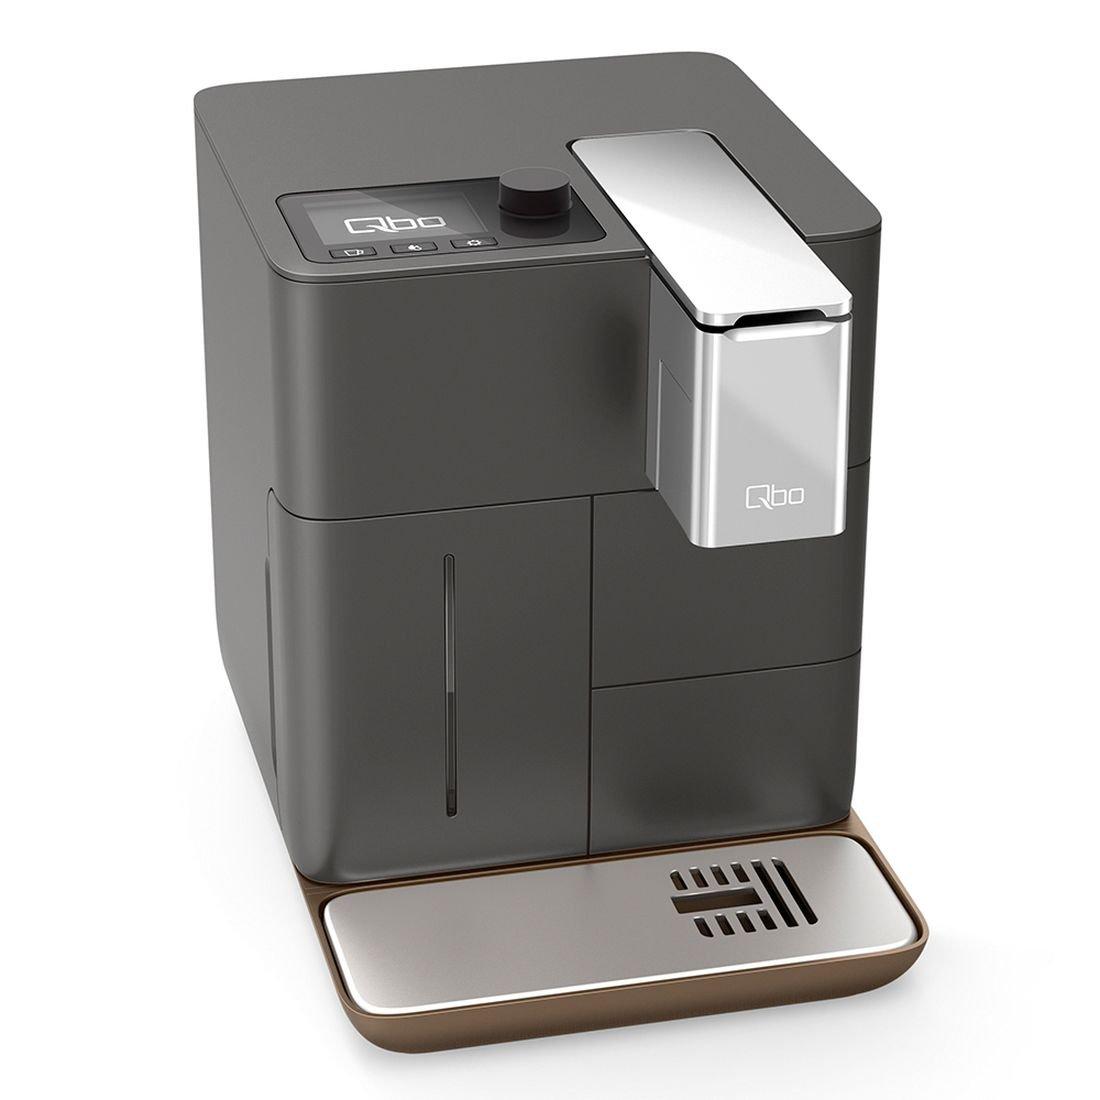 QBO You de Rista - Cafetera de cápsulas espresso y Caffè ...